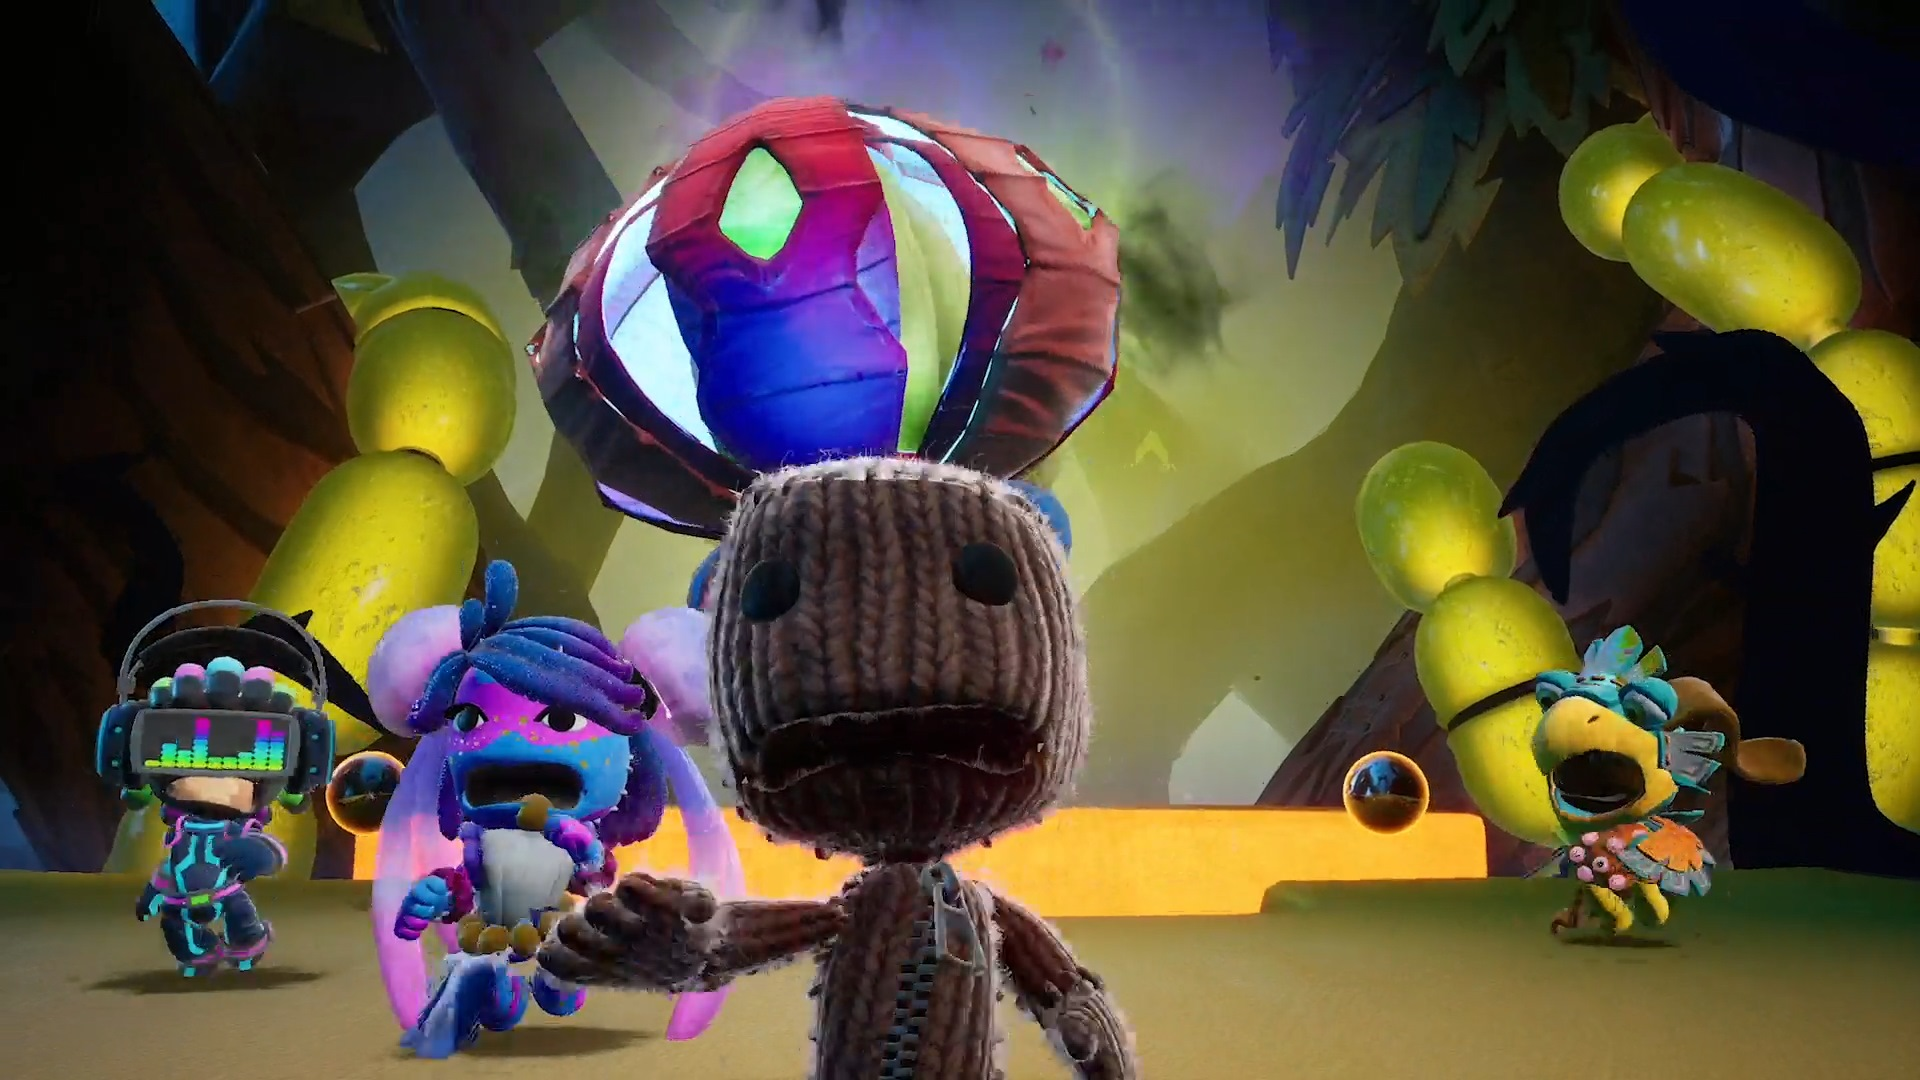 LittleBigPlanet returns with Sackboy: A Big Adventure | Shacknews